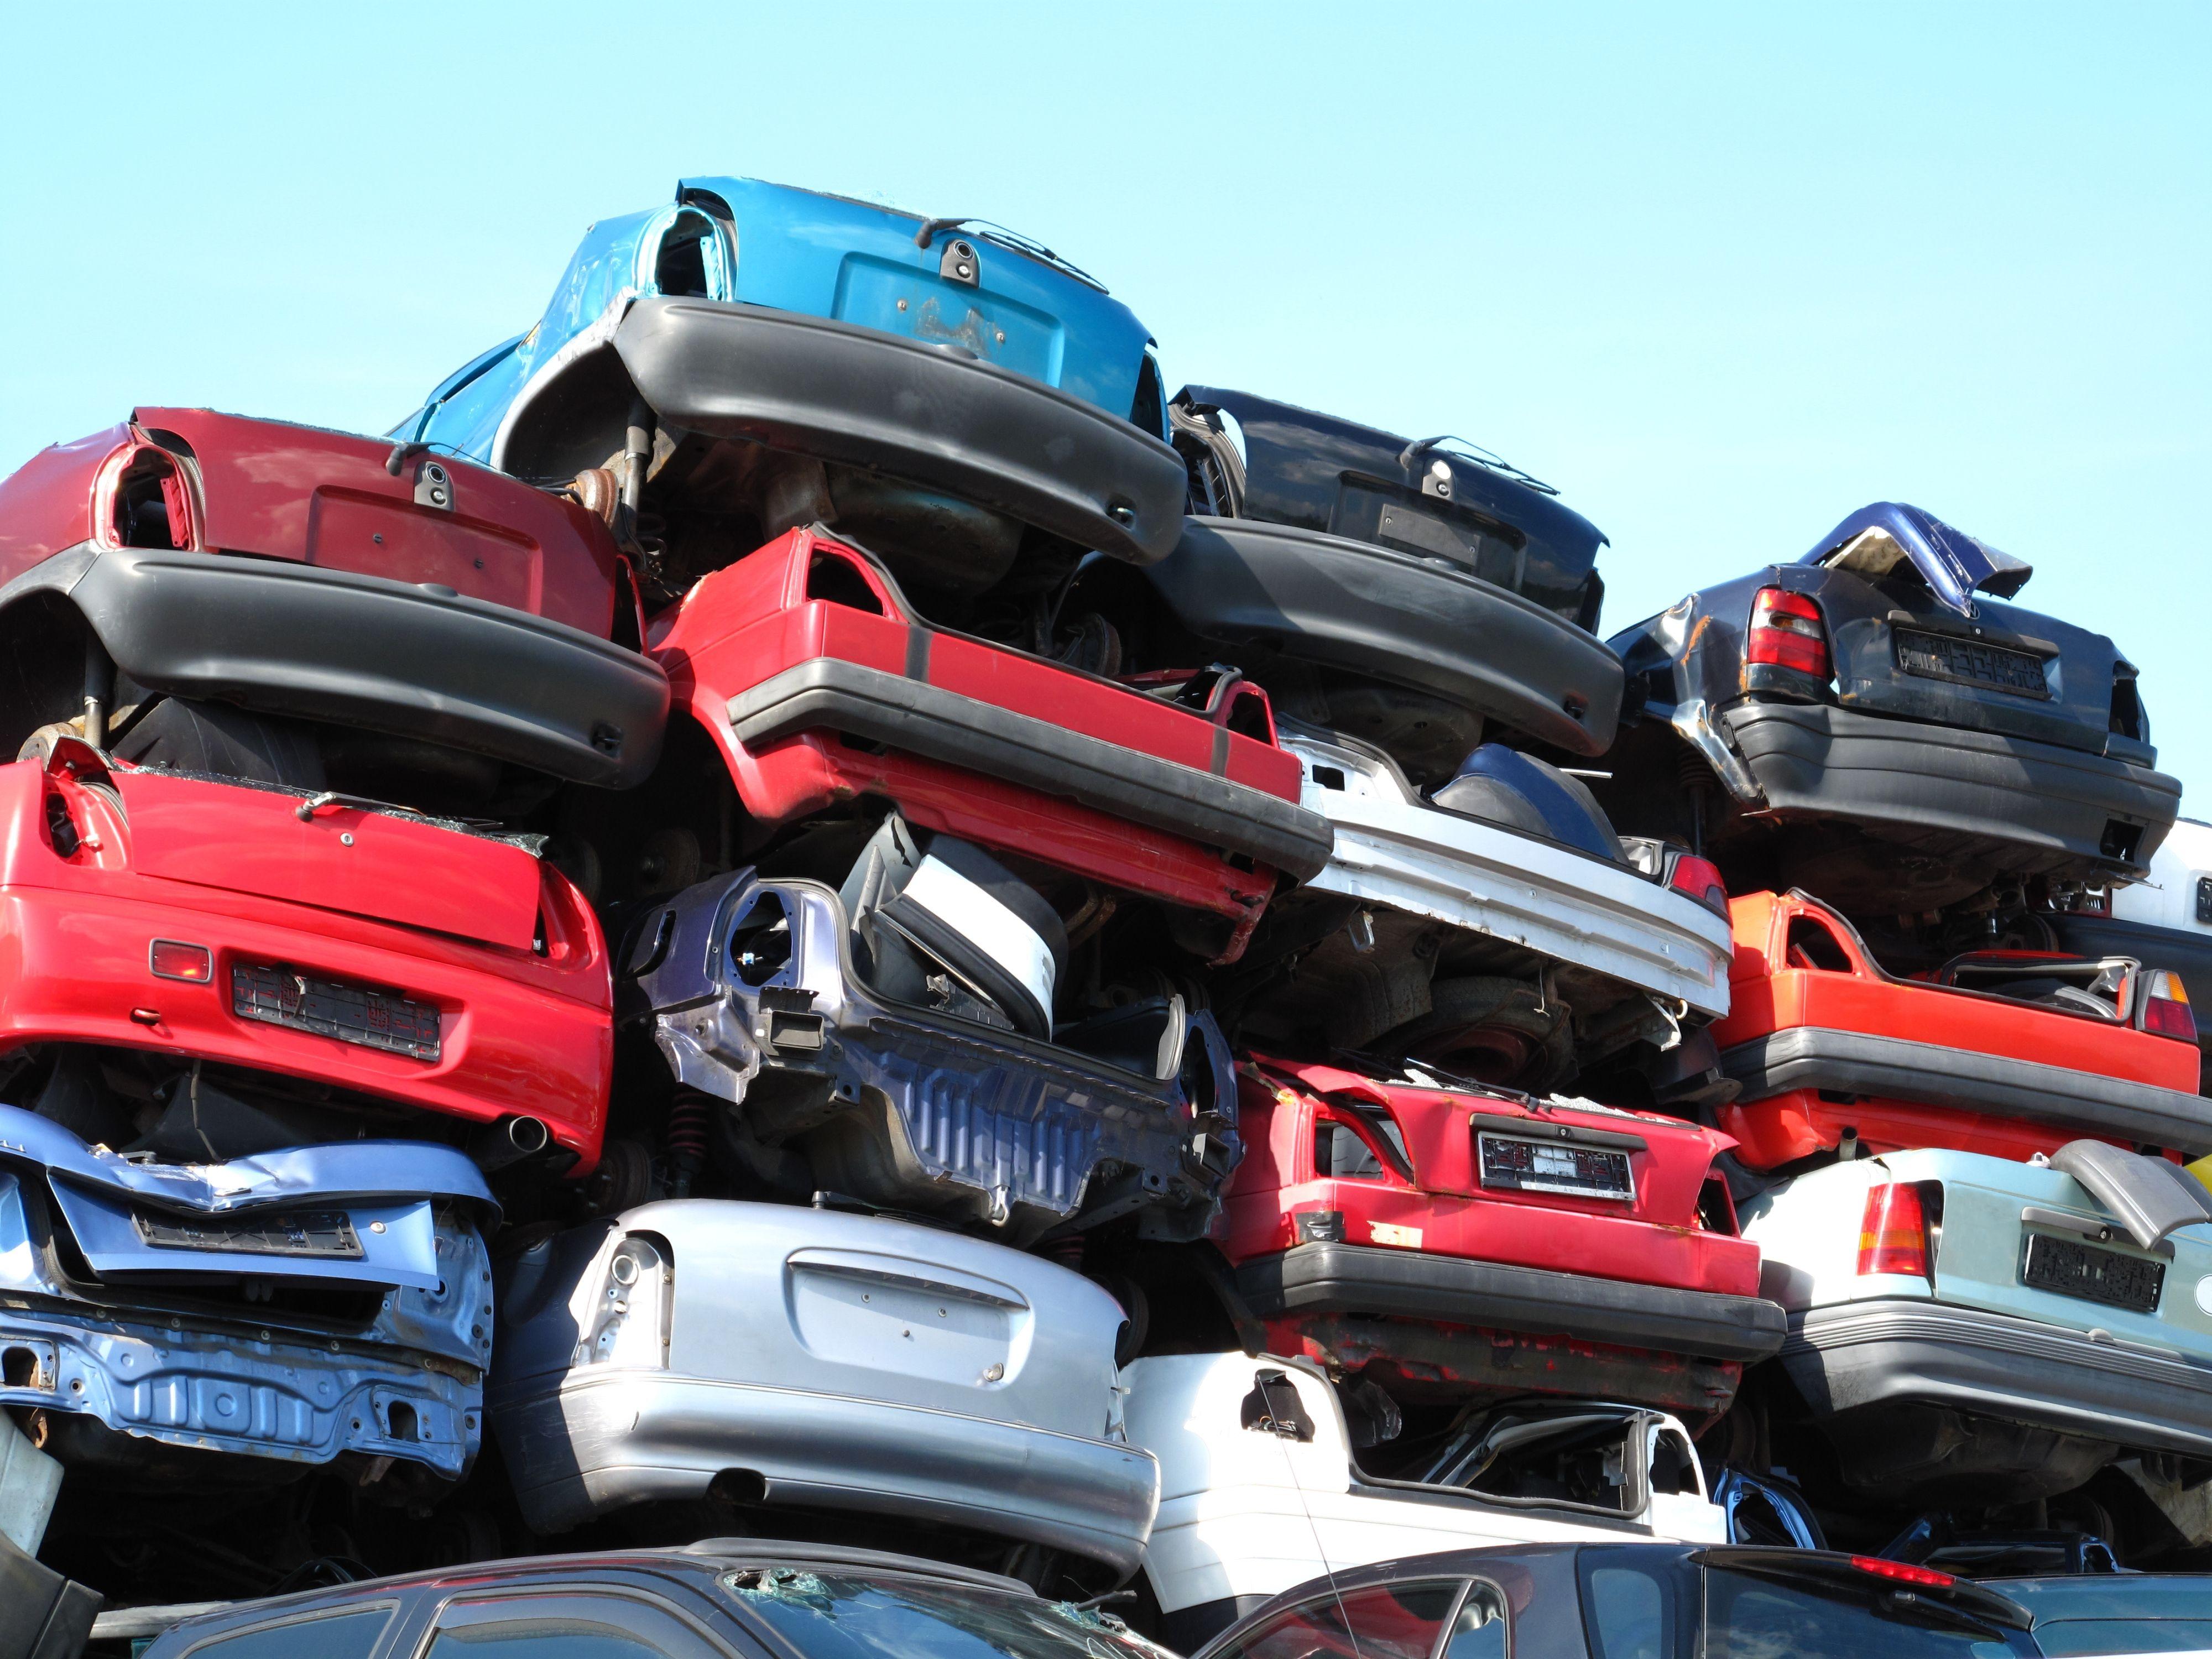 Baja definitiva: Servicios de BrotonAuto